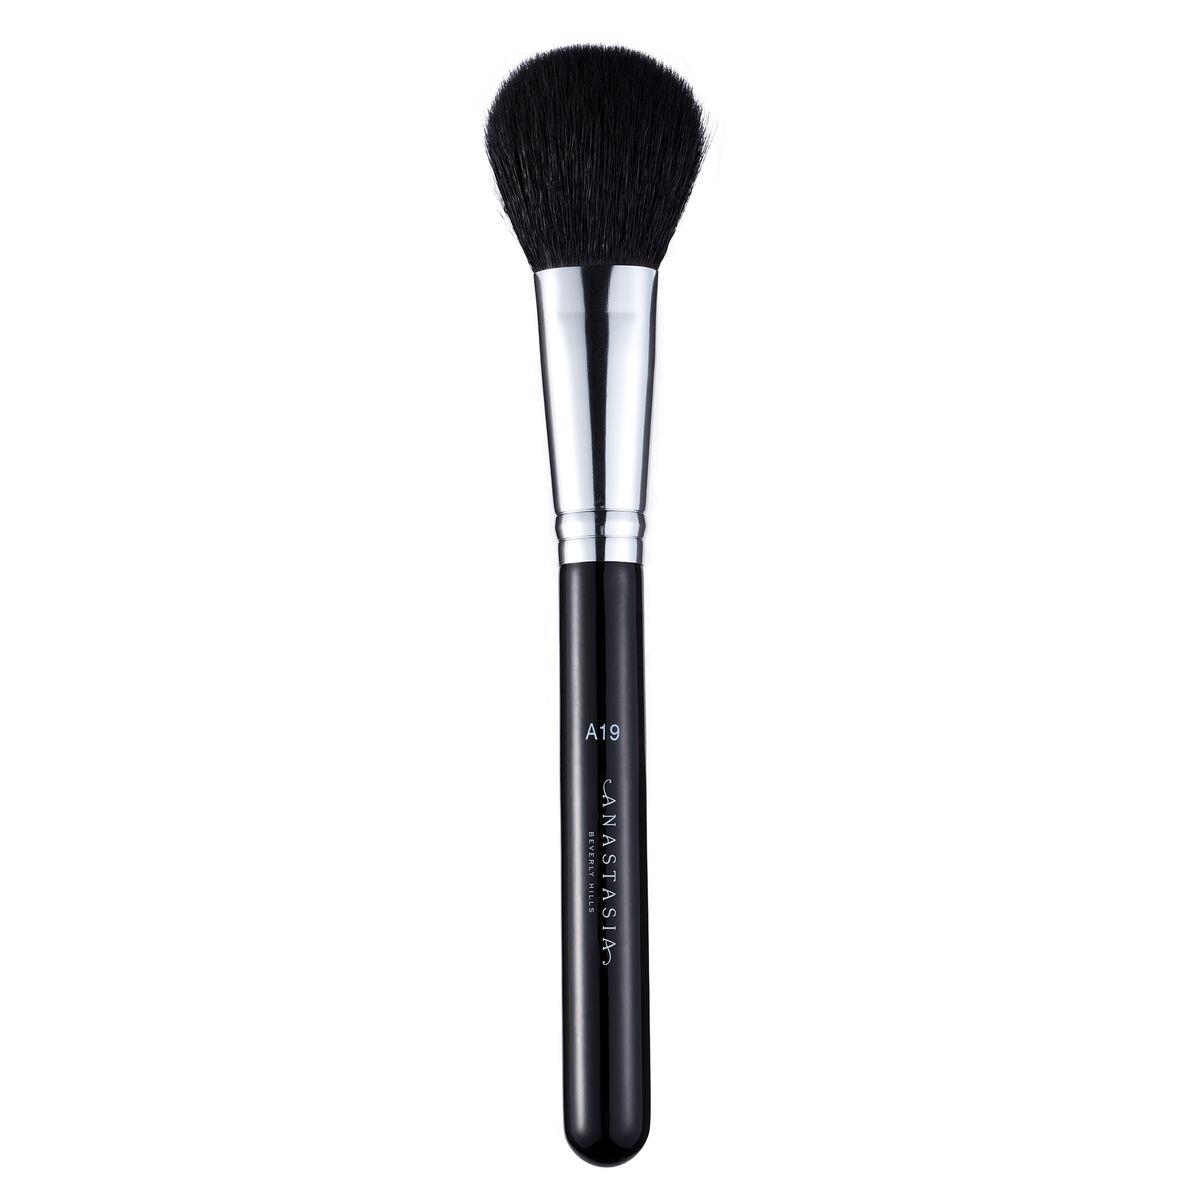 Pro Brush- A19 Blush Brush